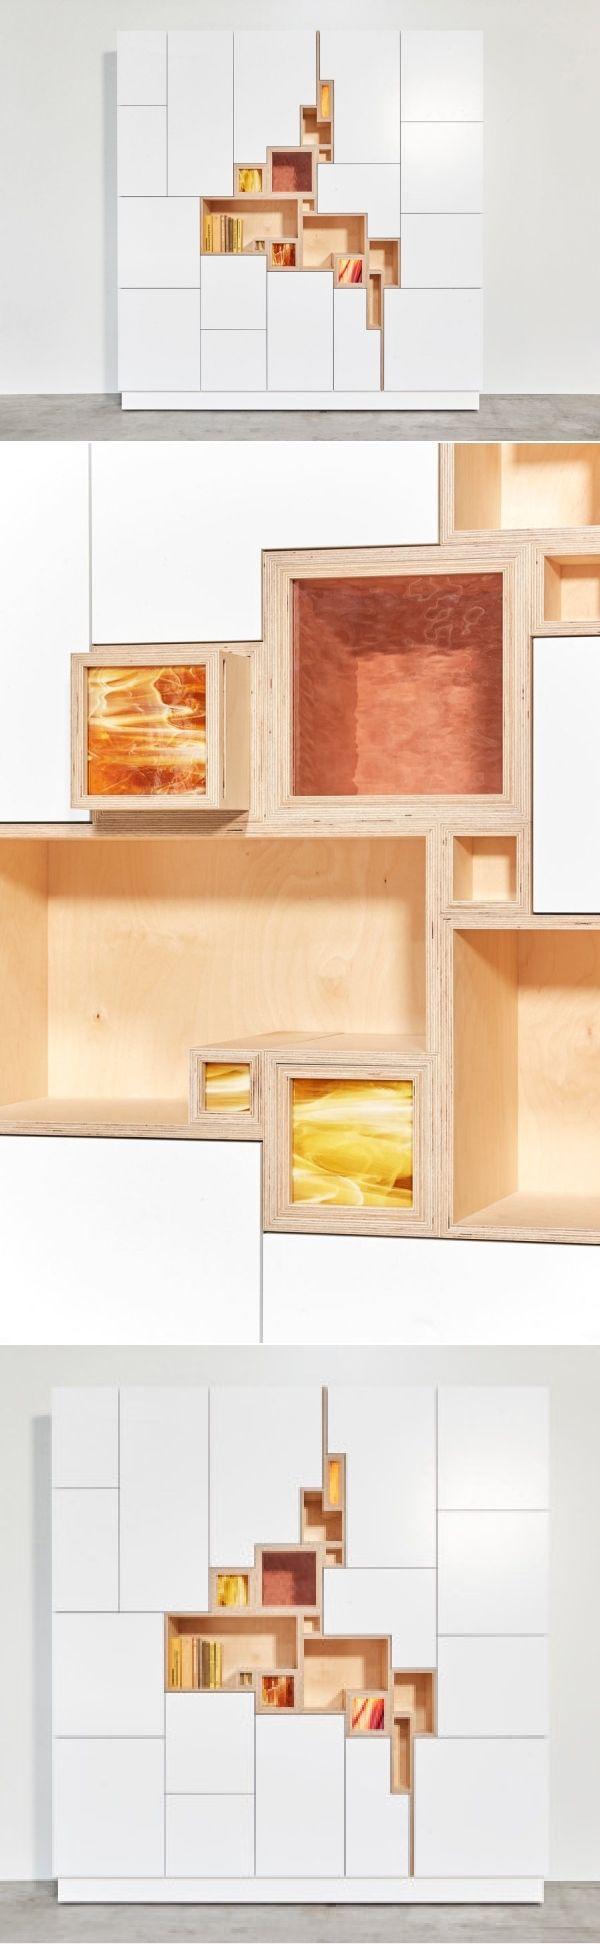 Rupture: A Wall Cabinet by Filip Janssens - Design Milk